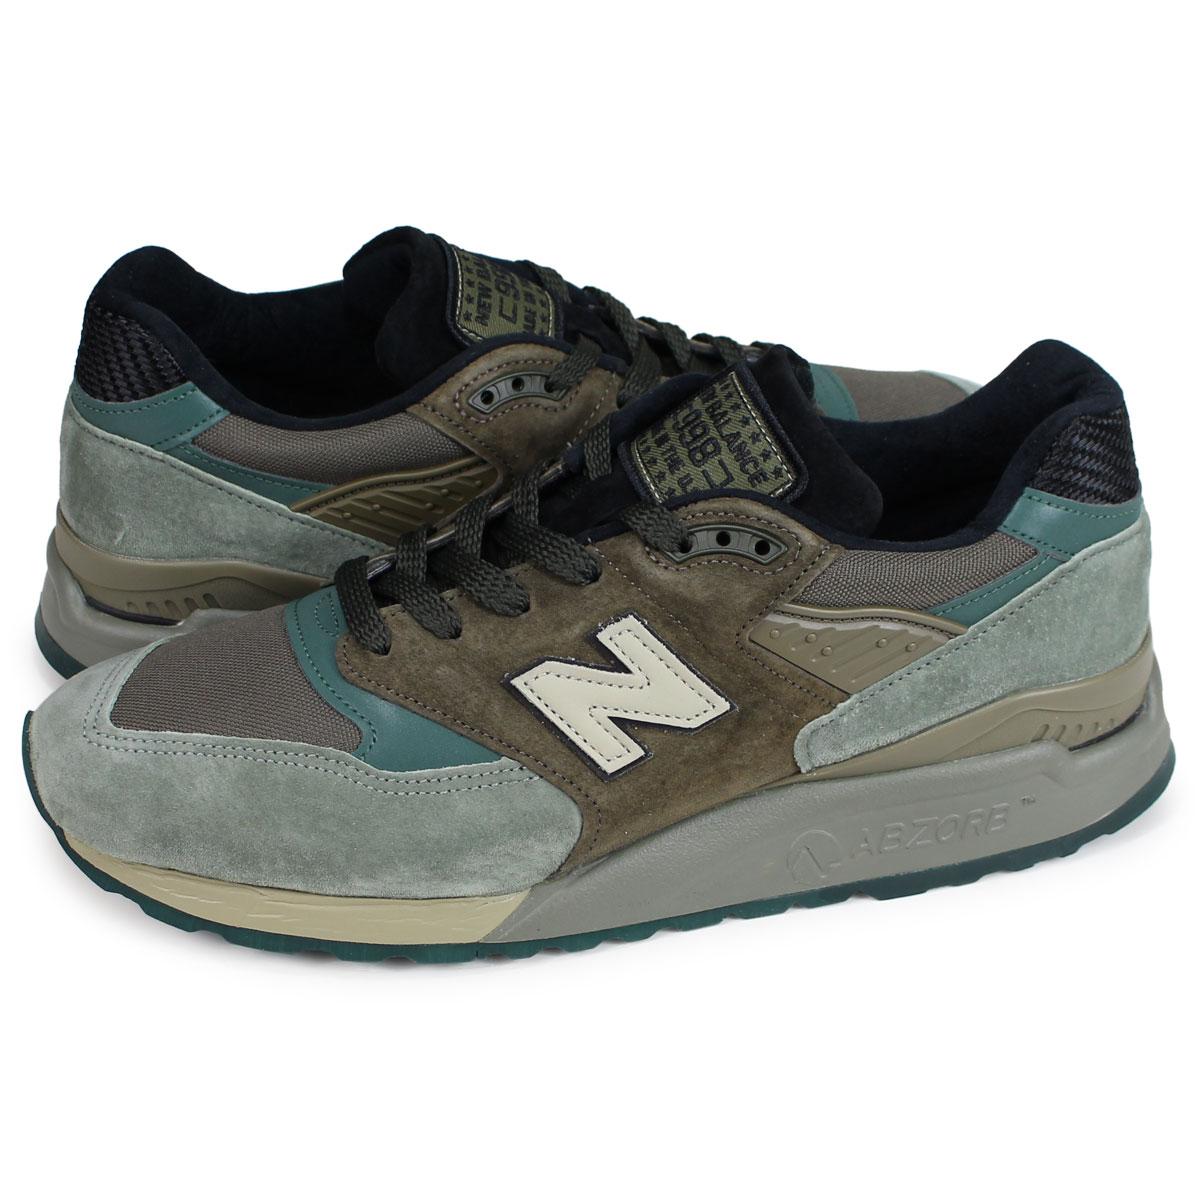 NEW BALANCE 998 Sneakers (M998AWA)